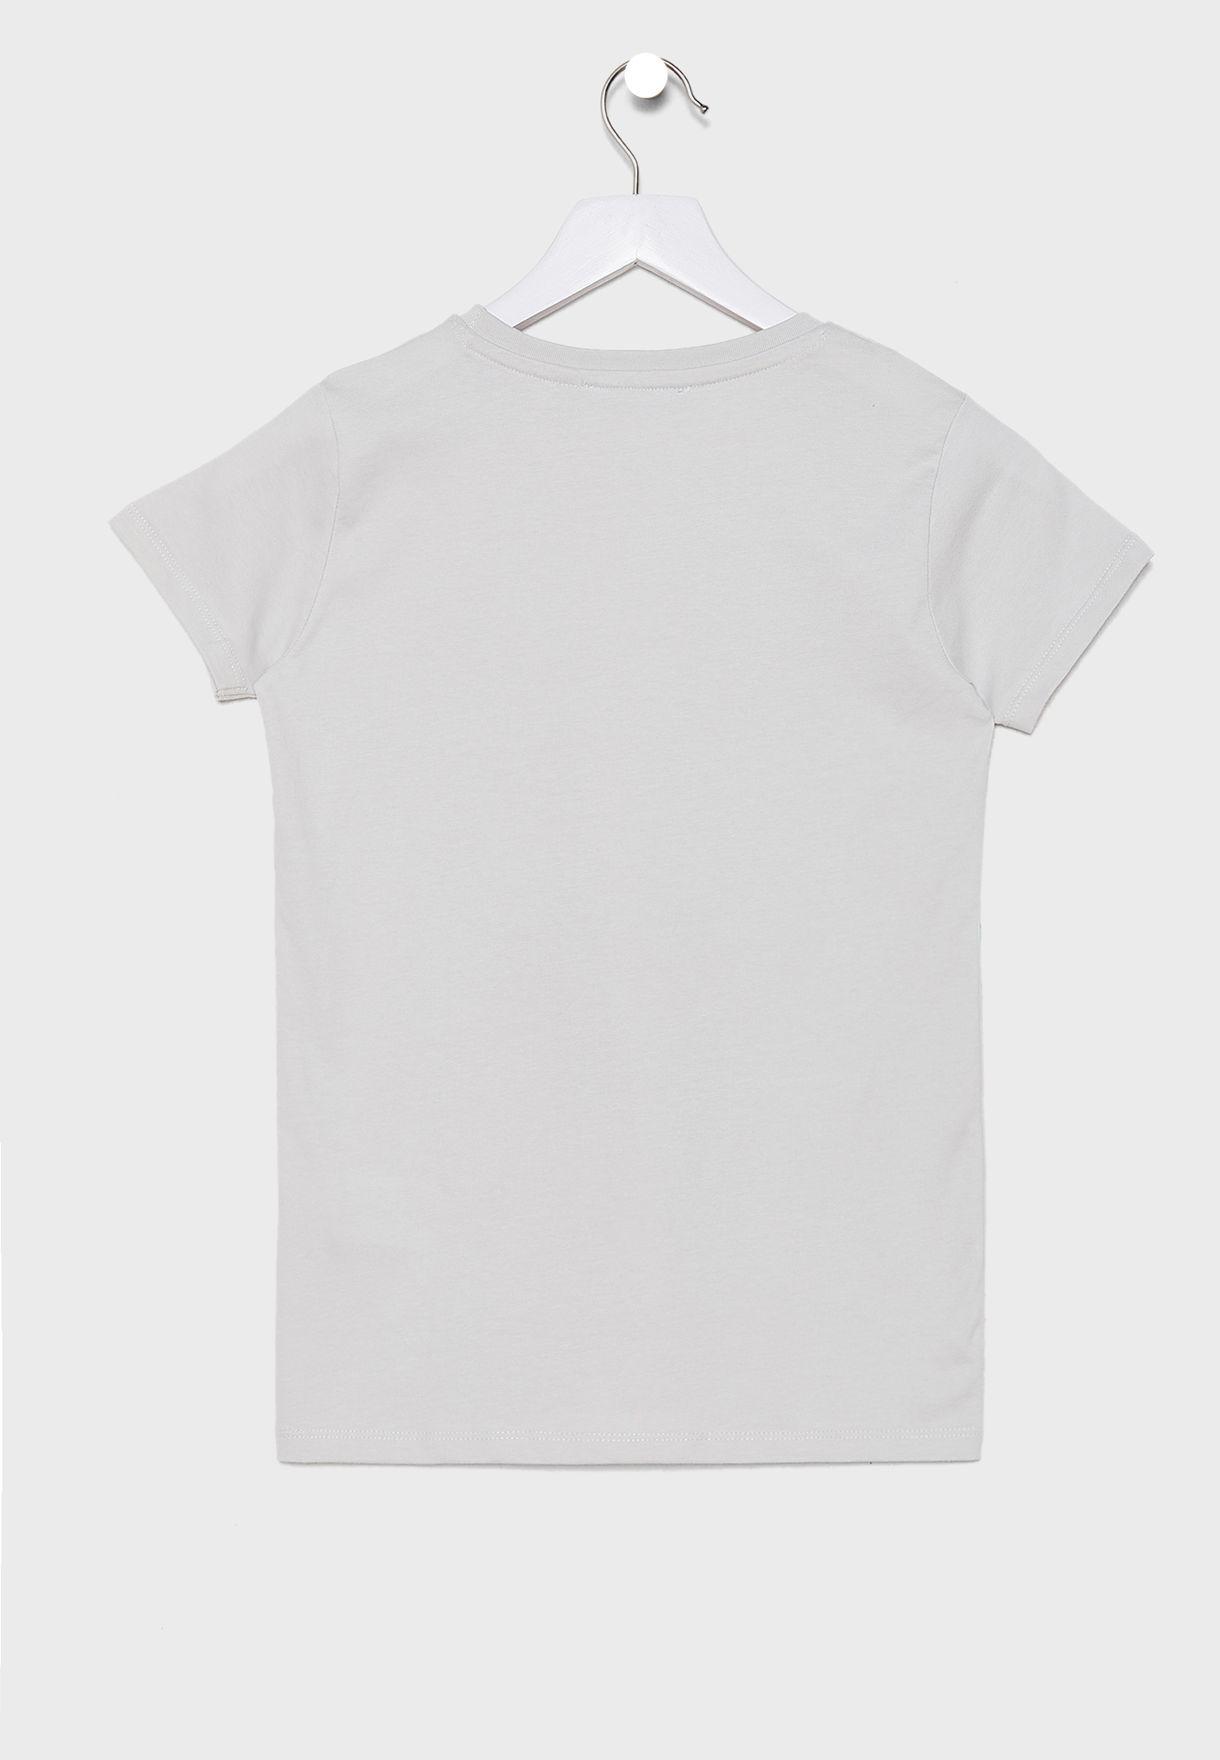 Teen Graphic T-Shirt + Striped Shorts Set